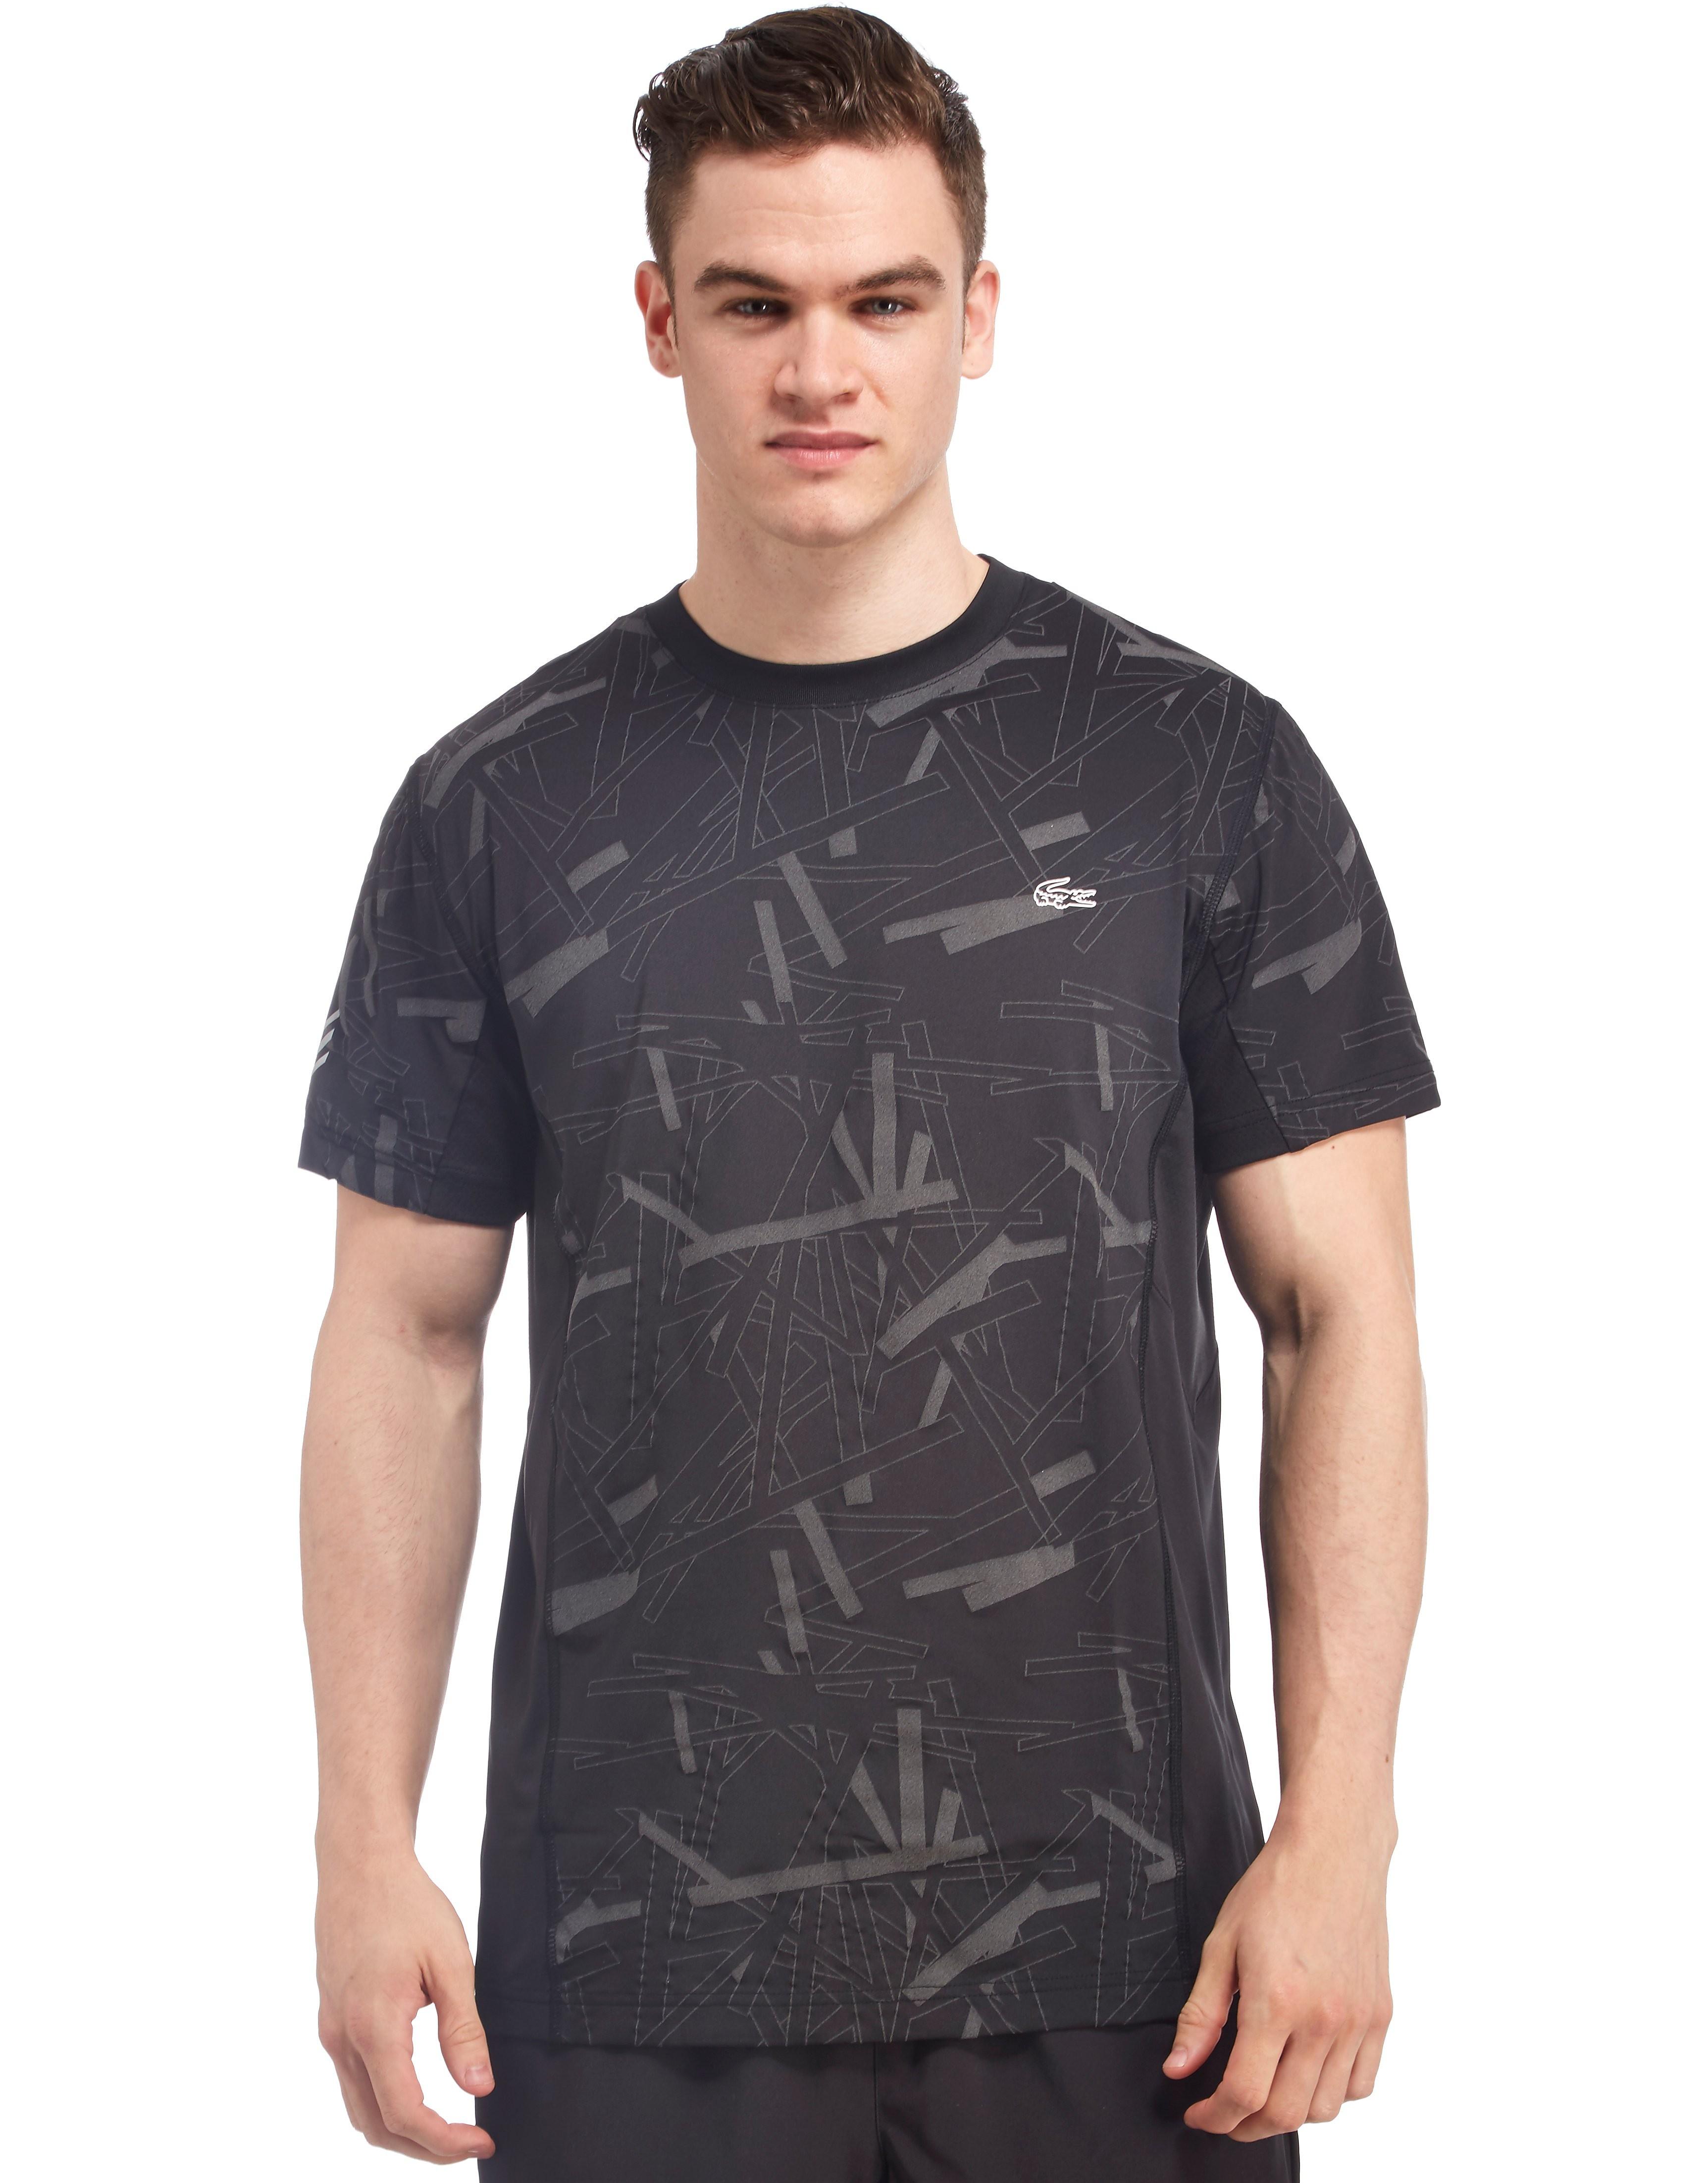 Lacoste Tennis Print Stretch T-Shirt